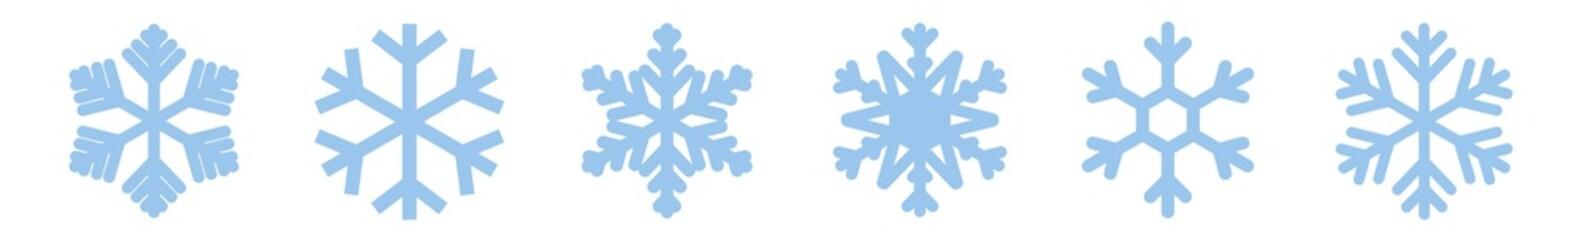 Snowflake Icon Blue | Snowflakes | Ice Crystal Winter Symbol | Christmas Logo | Xmas Sign | Variations